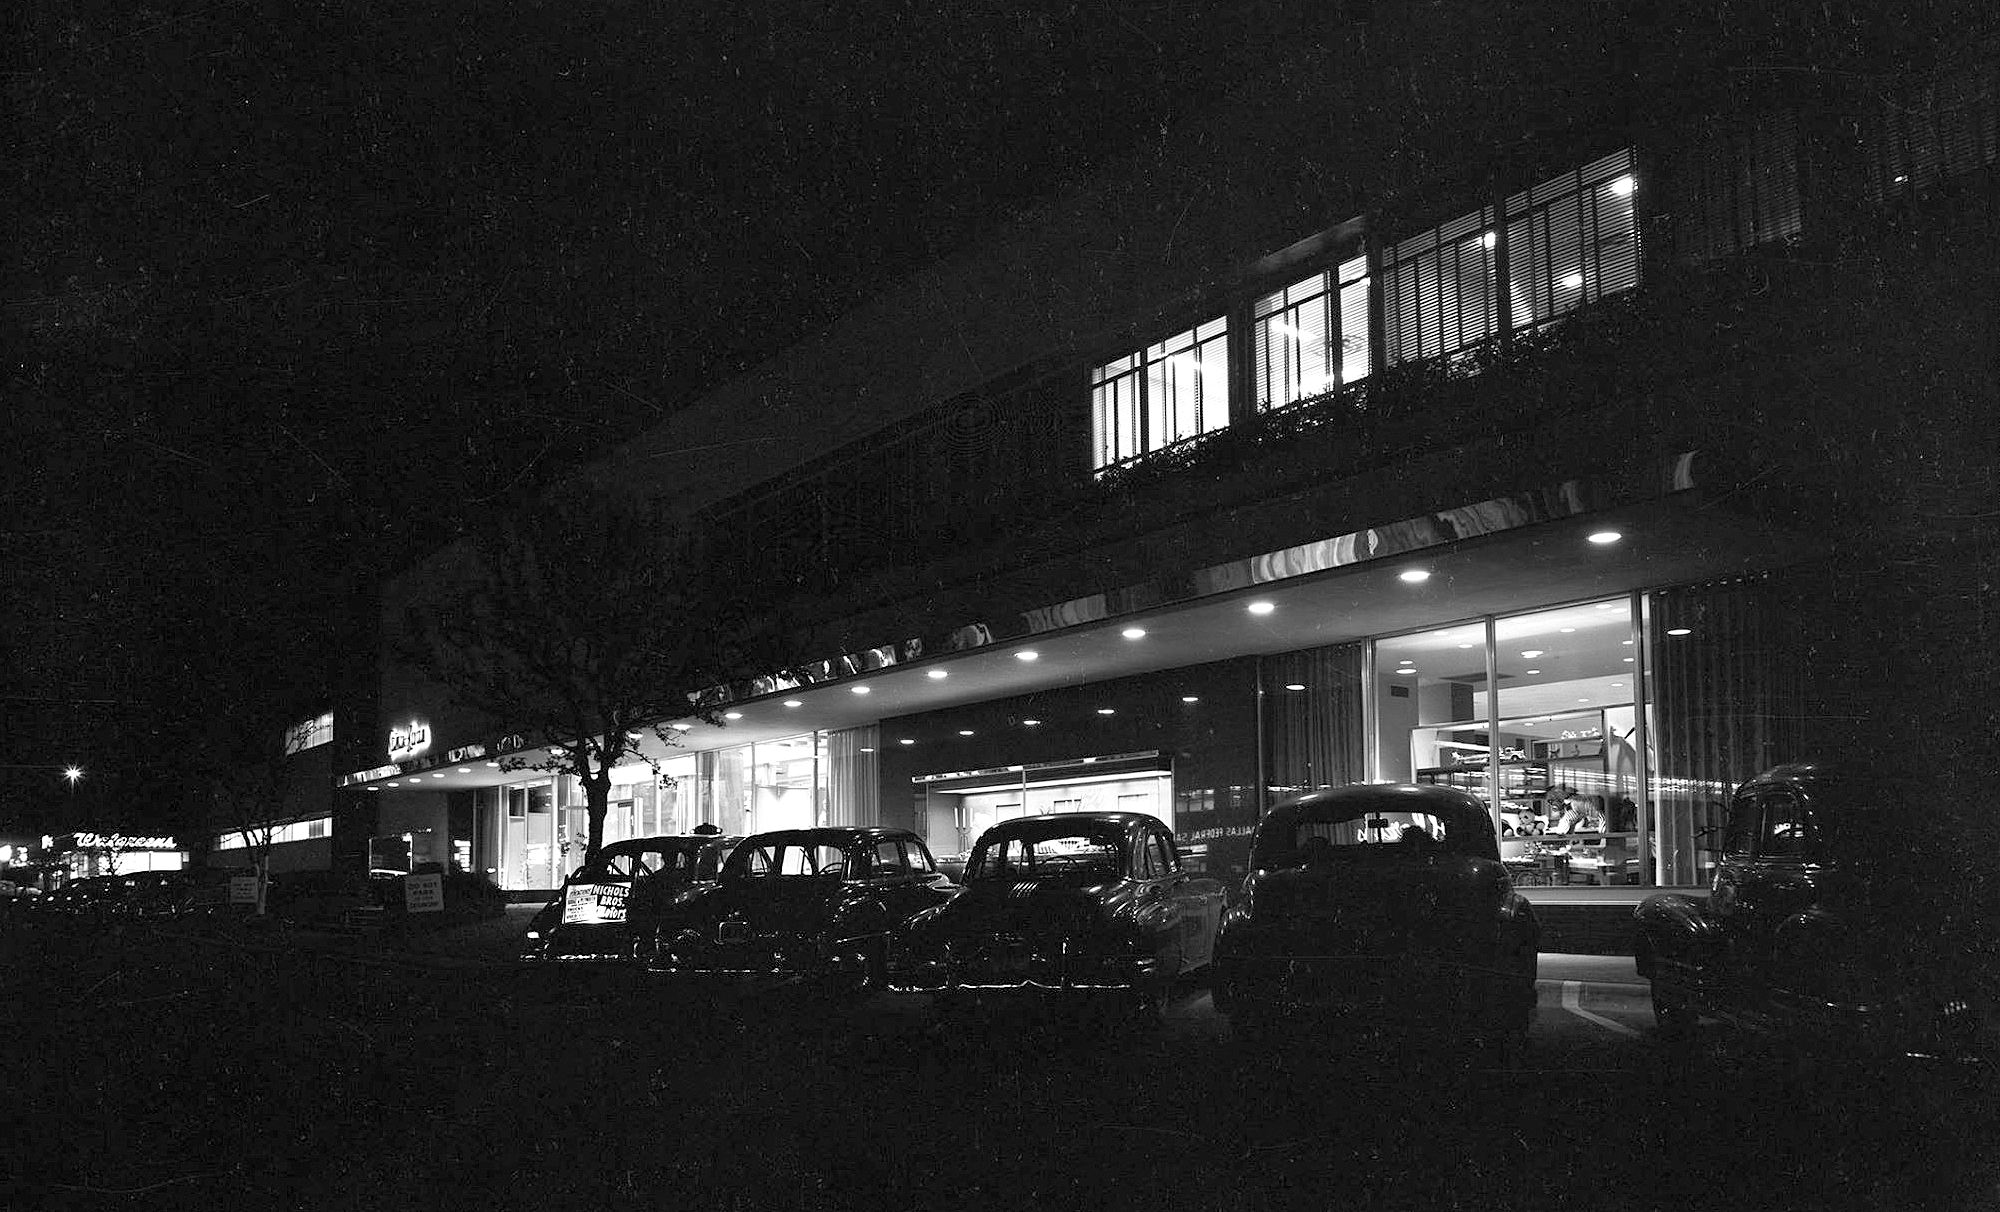 n-m_preston_night_squire-haskins_UTA_1952_b